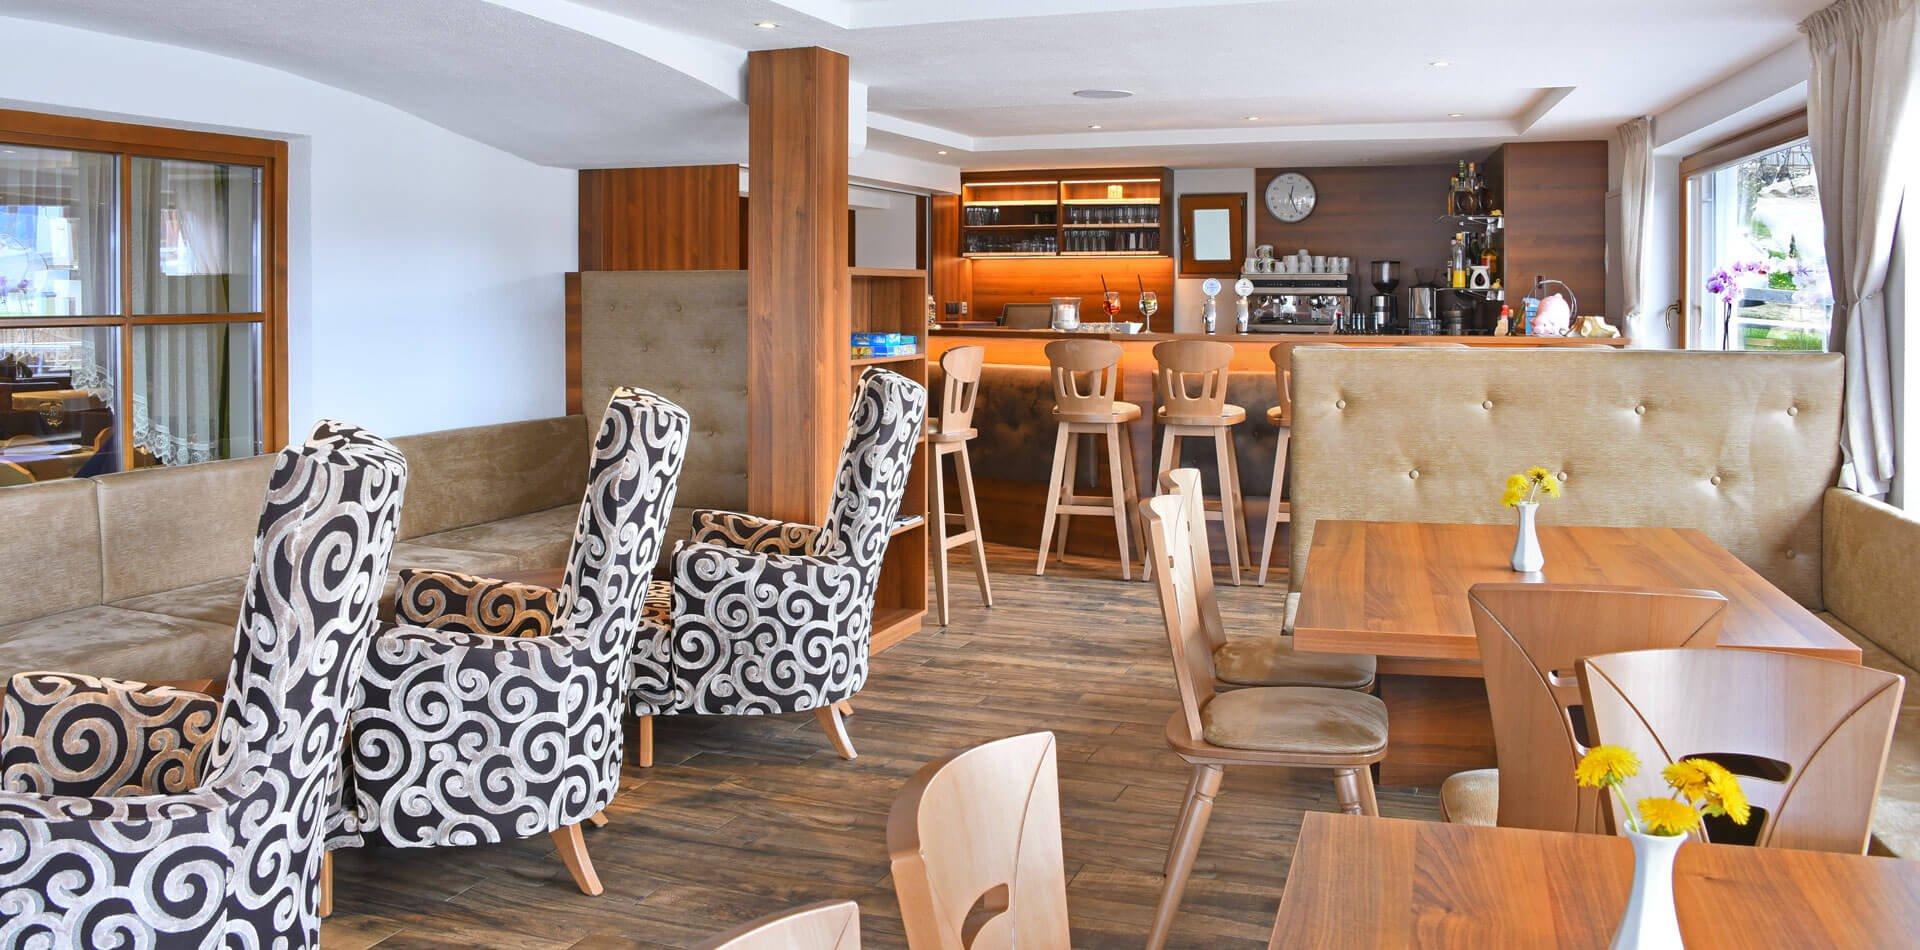 hotel-meransen-eisacktal-lounge-bar